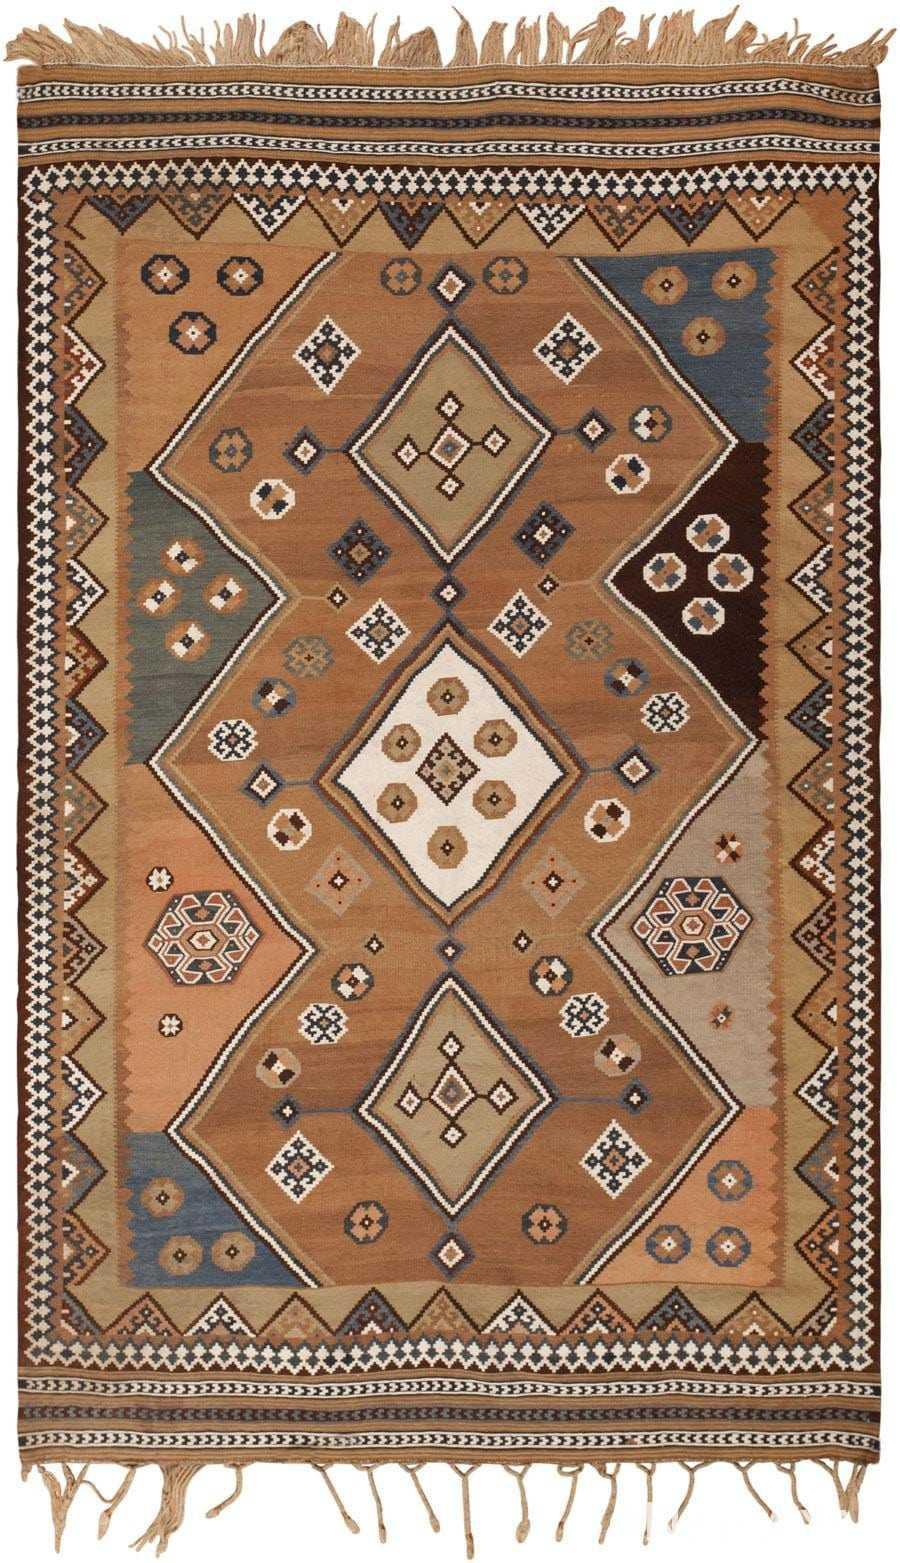 Antique Persian Kilim 45782 Detail/Large View